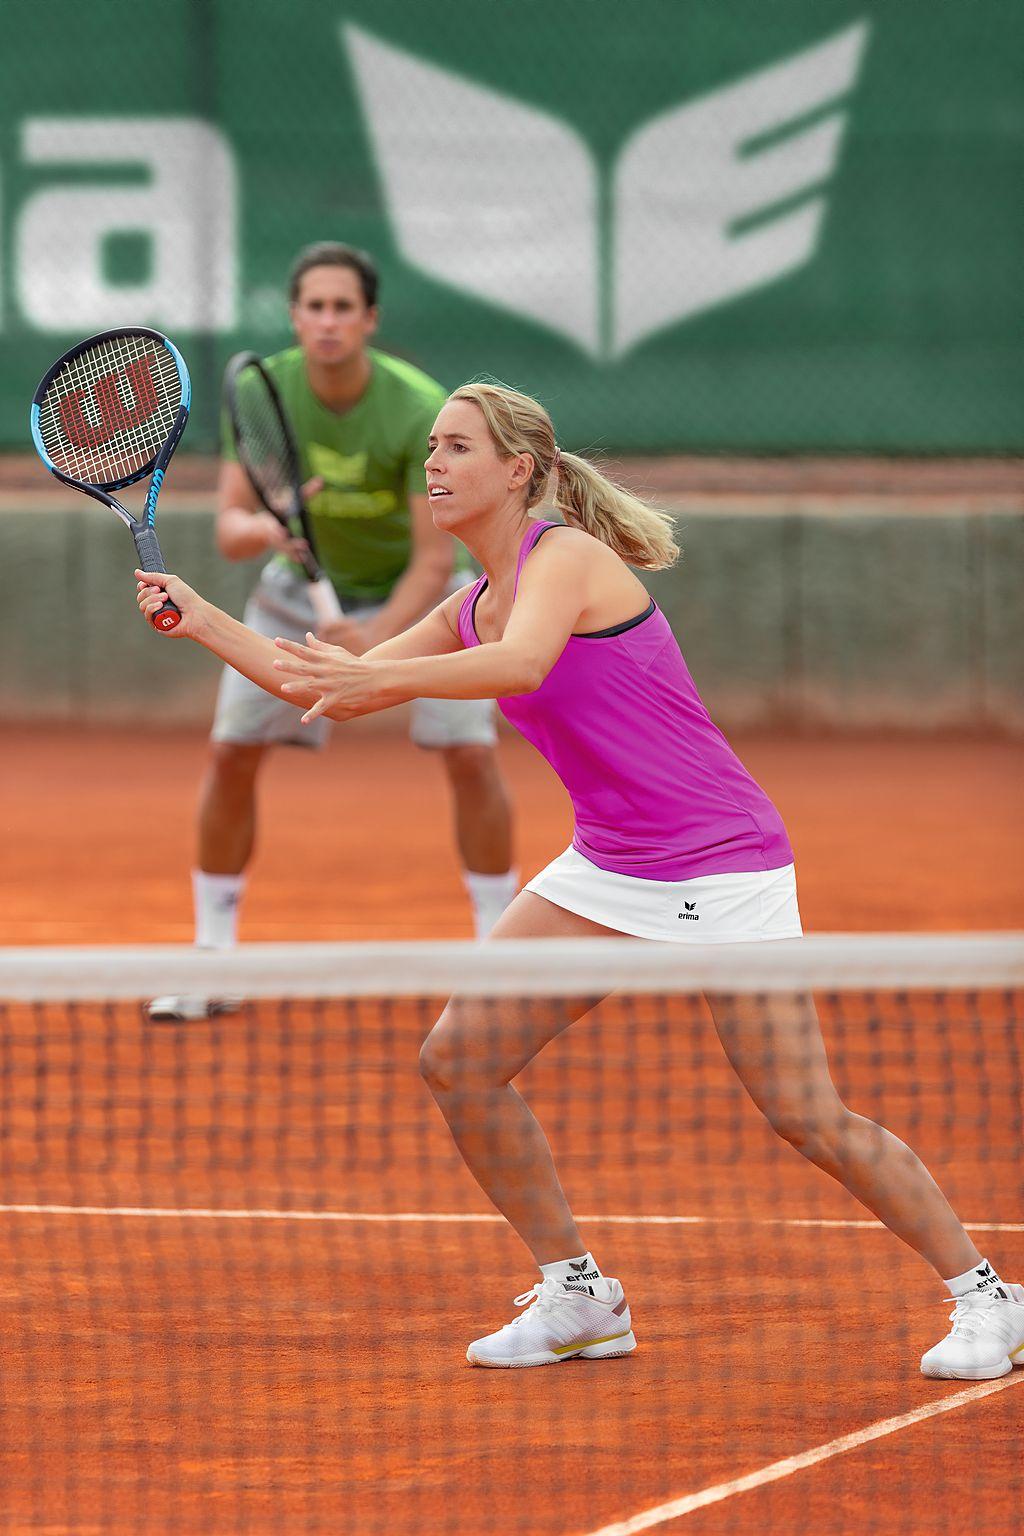 media/image/Tennis_3wT8AZgWY26CVU.jpg